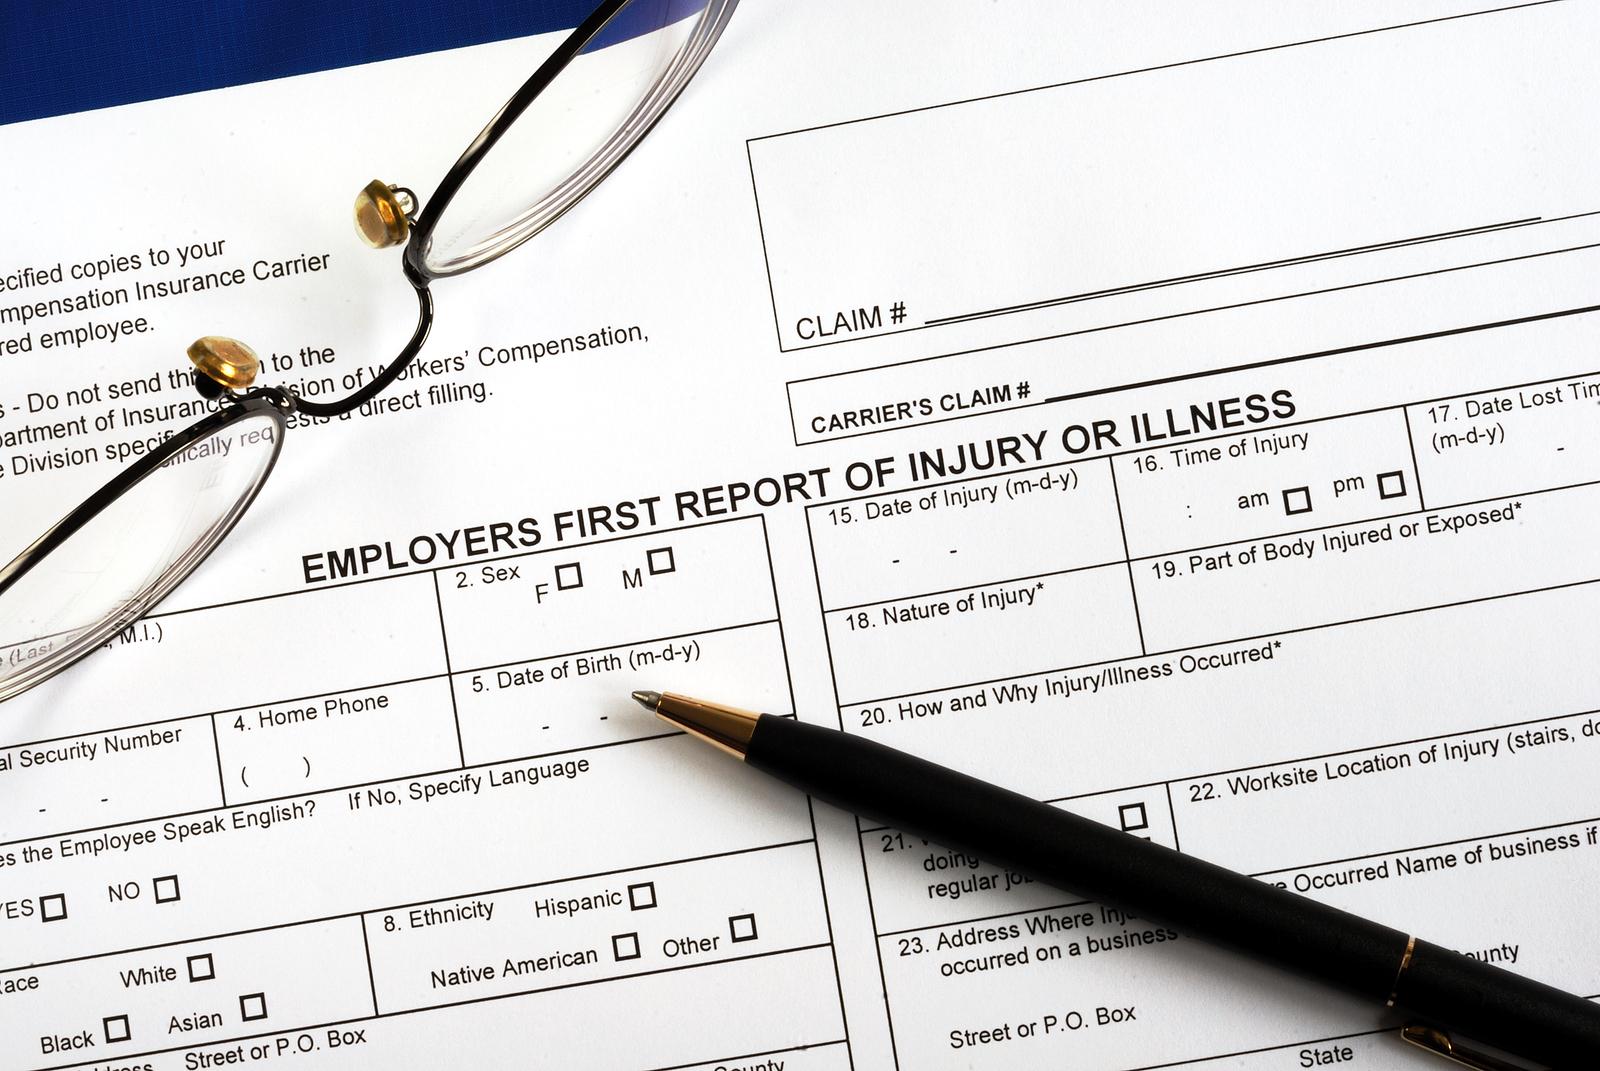 Faq Workers Compensation Turley Redmond Rosasco Claim Form Oxford Health Claim Form